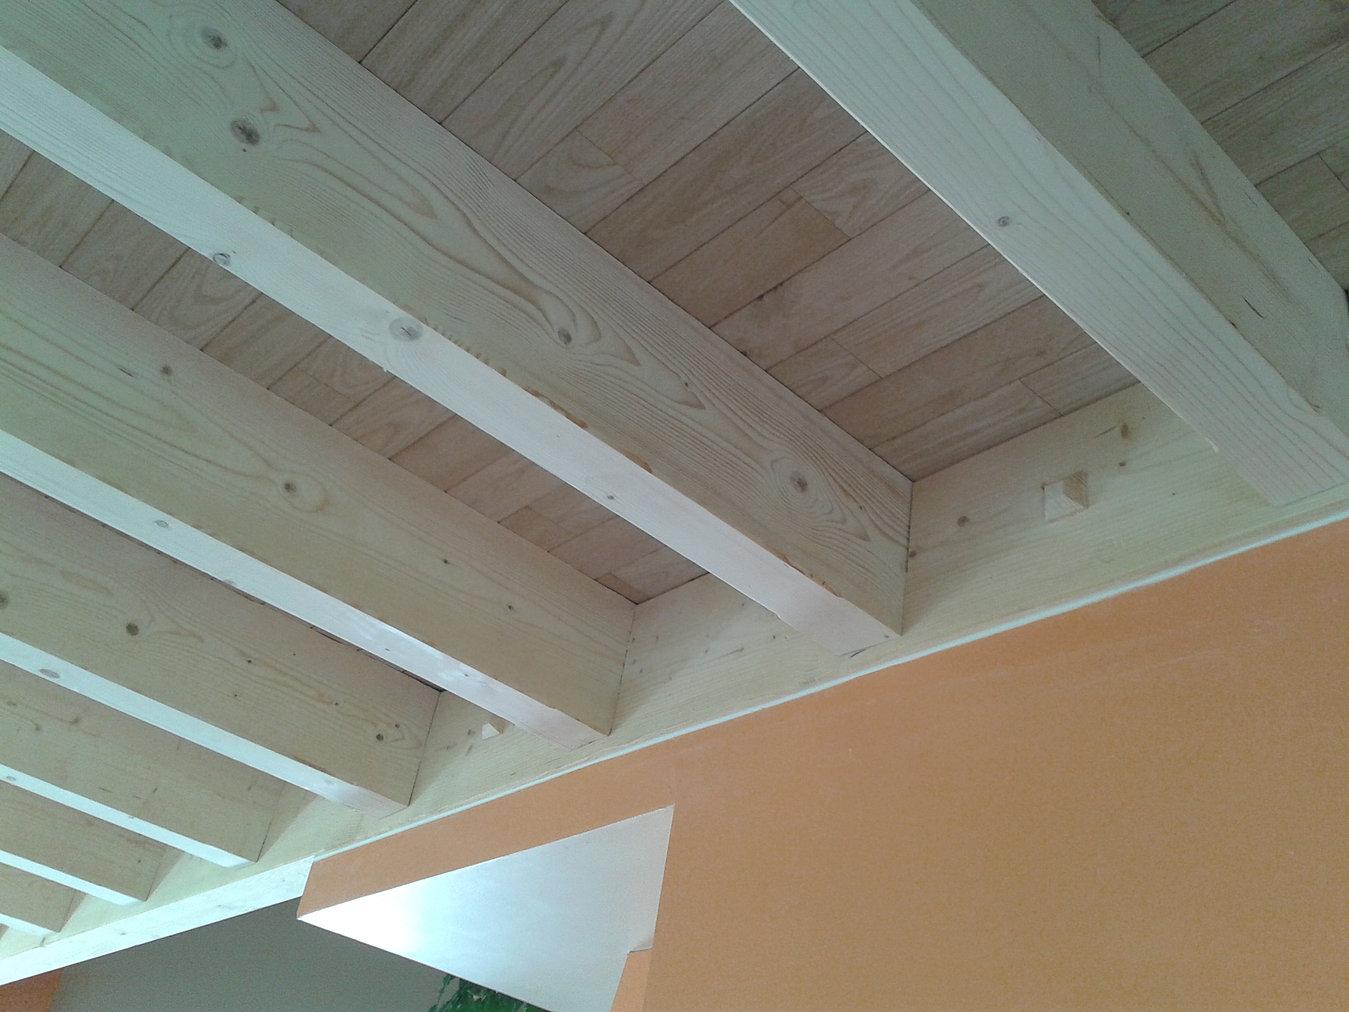 plancher bois massif amazing parquet massif sur carrelage carrelage sur parquet massif. Black Bedroom Furniture Sets. Home Design Ideas